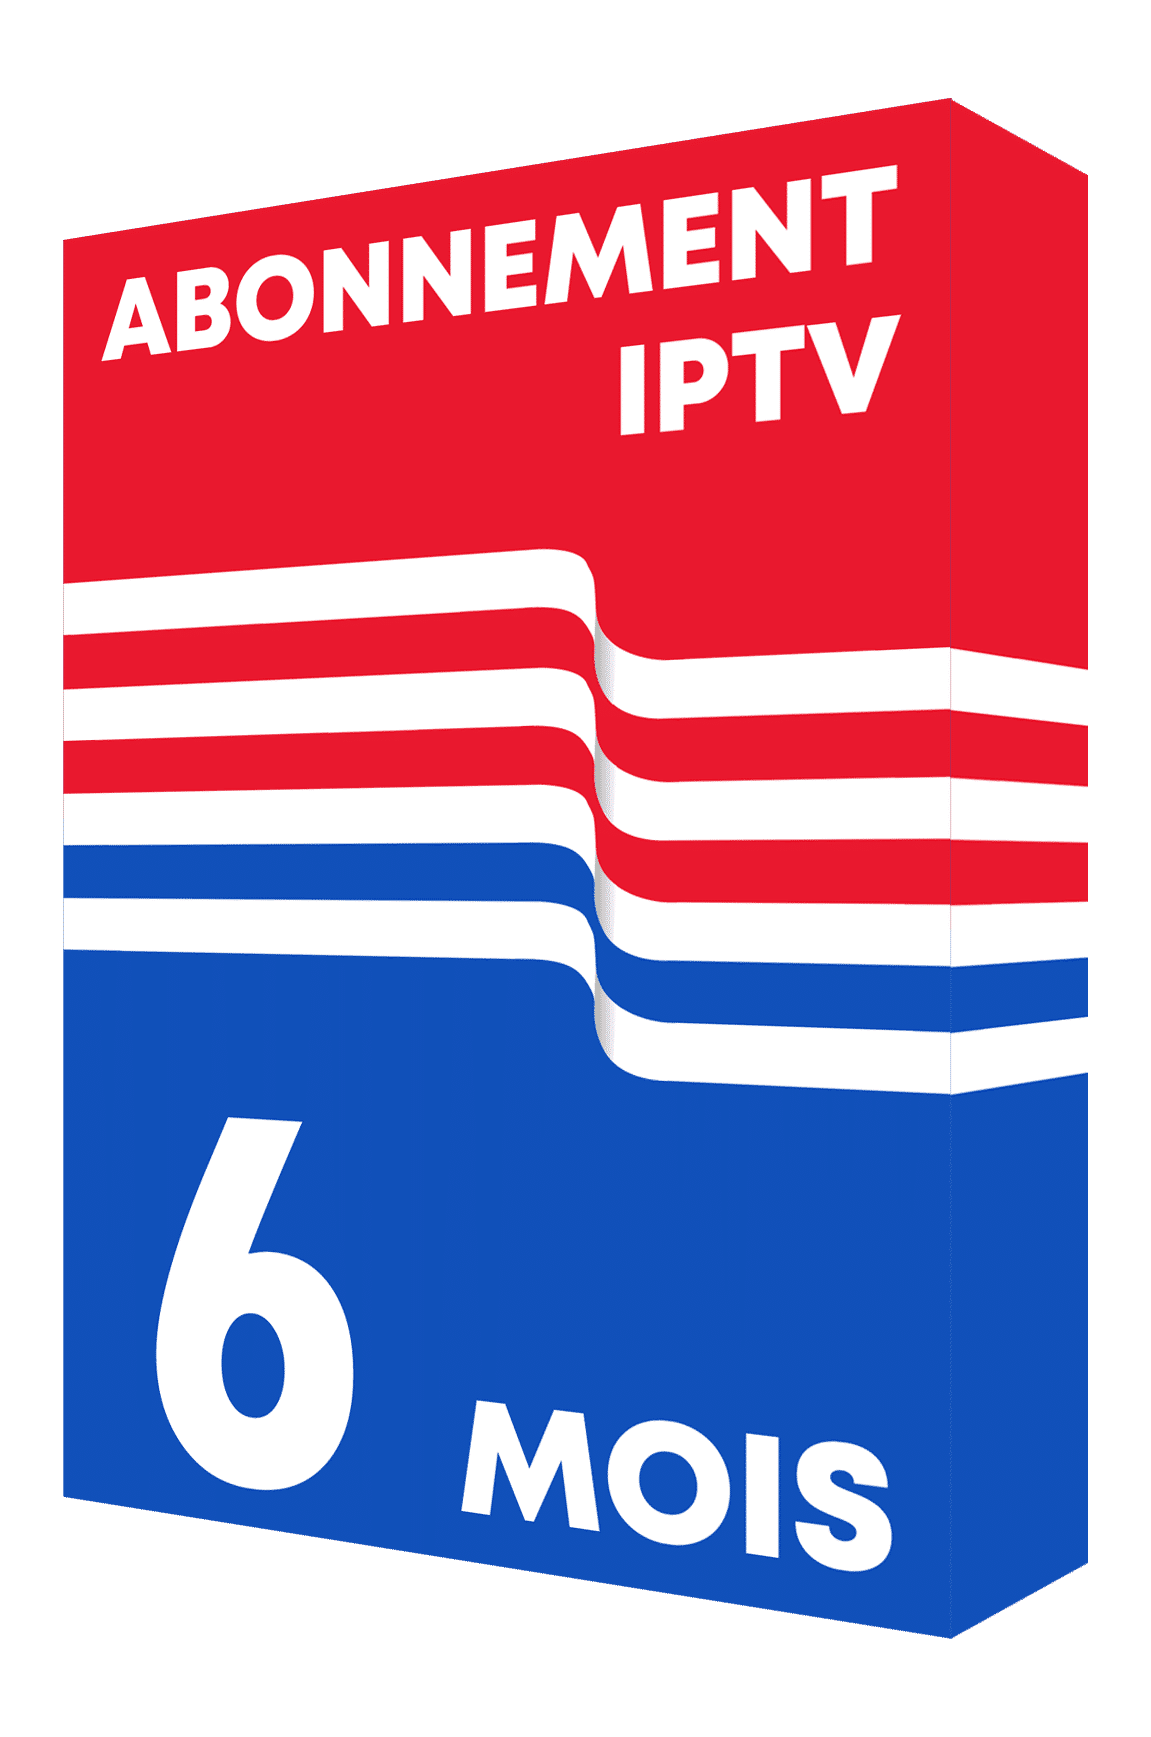 abonnement iptv 6 mois